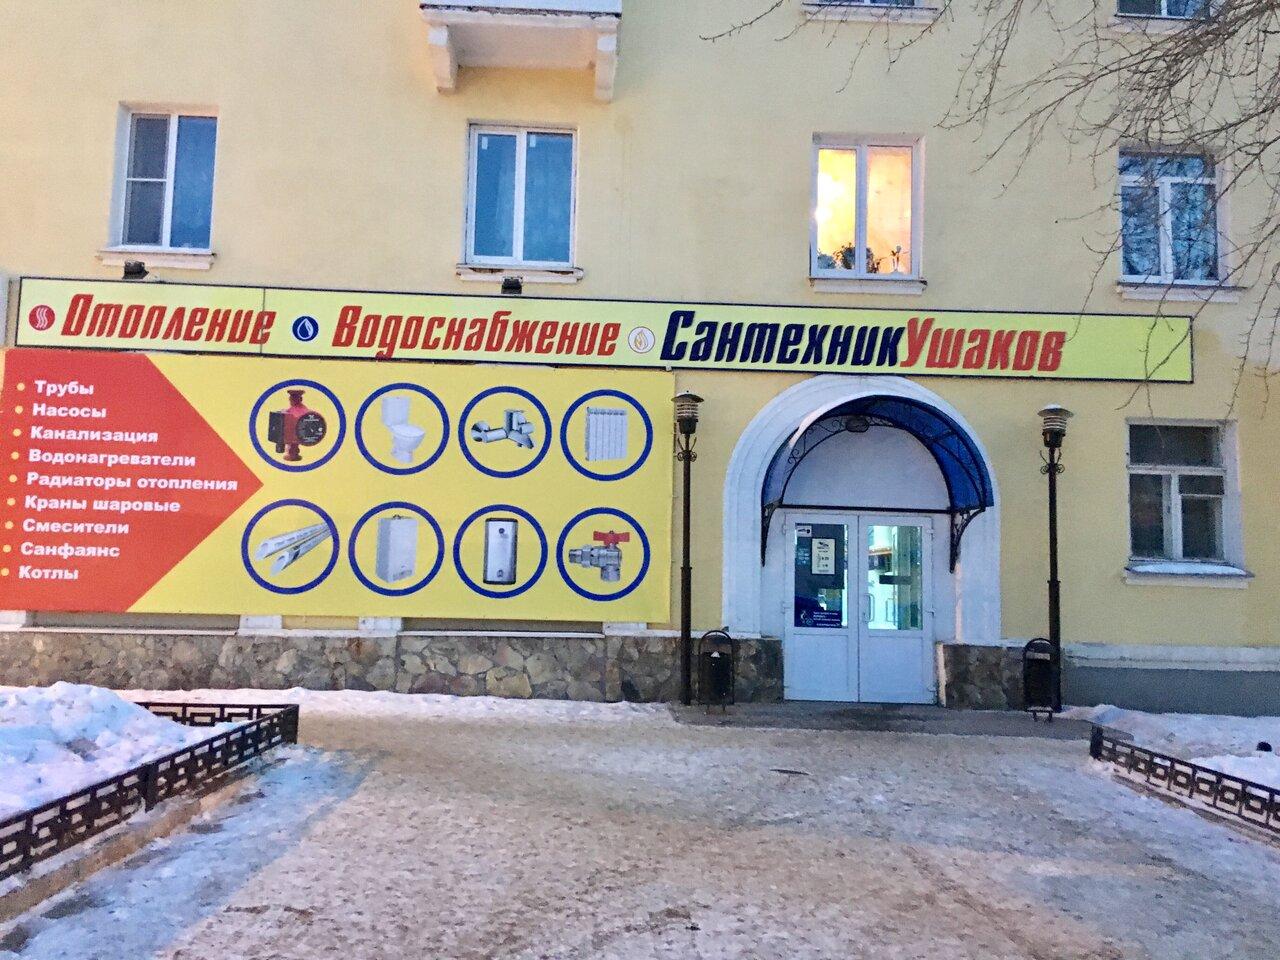 Магазин Сантехники Березовский